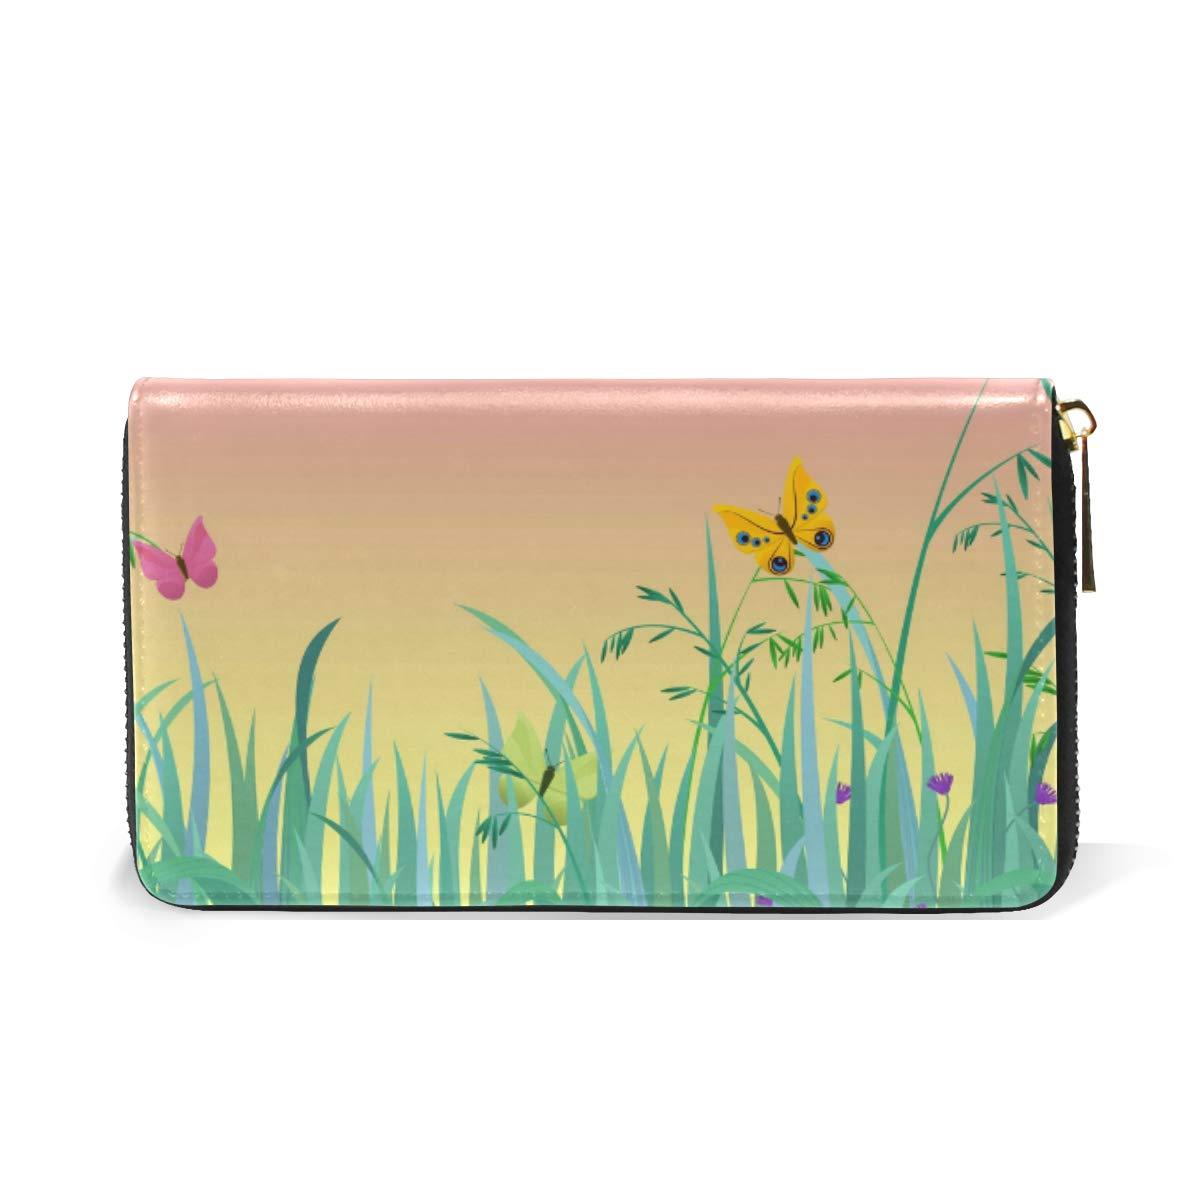 Women Wallet Coin Purse Phone Clutch Pouch Cash Bag,Sky Grass Female Girl Card Change Holder Organizer Storage Key Hold Elegant Handbag Gift